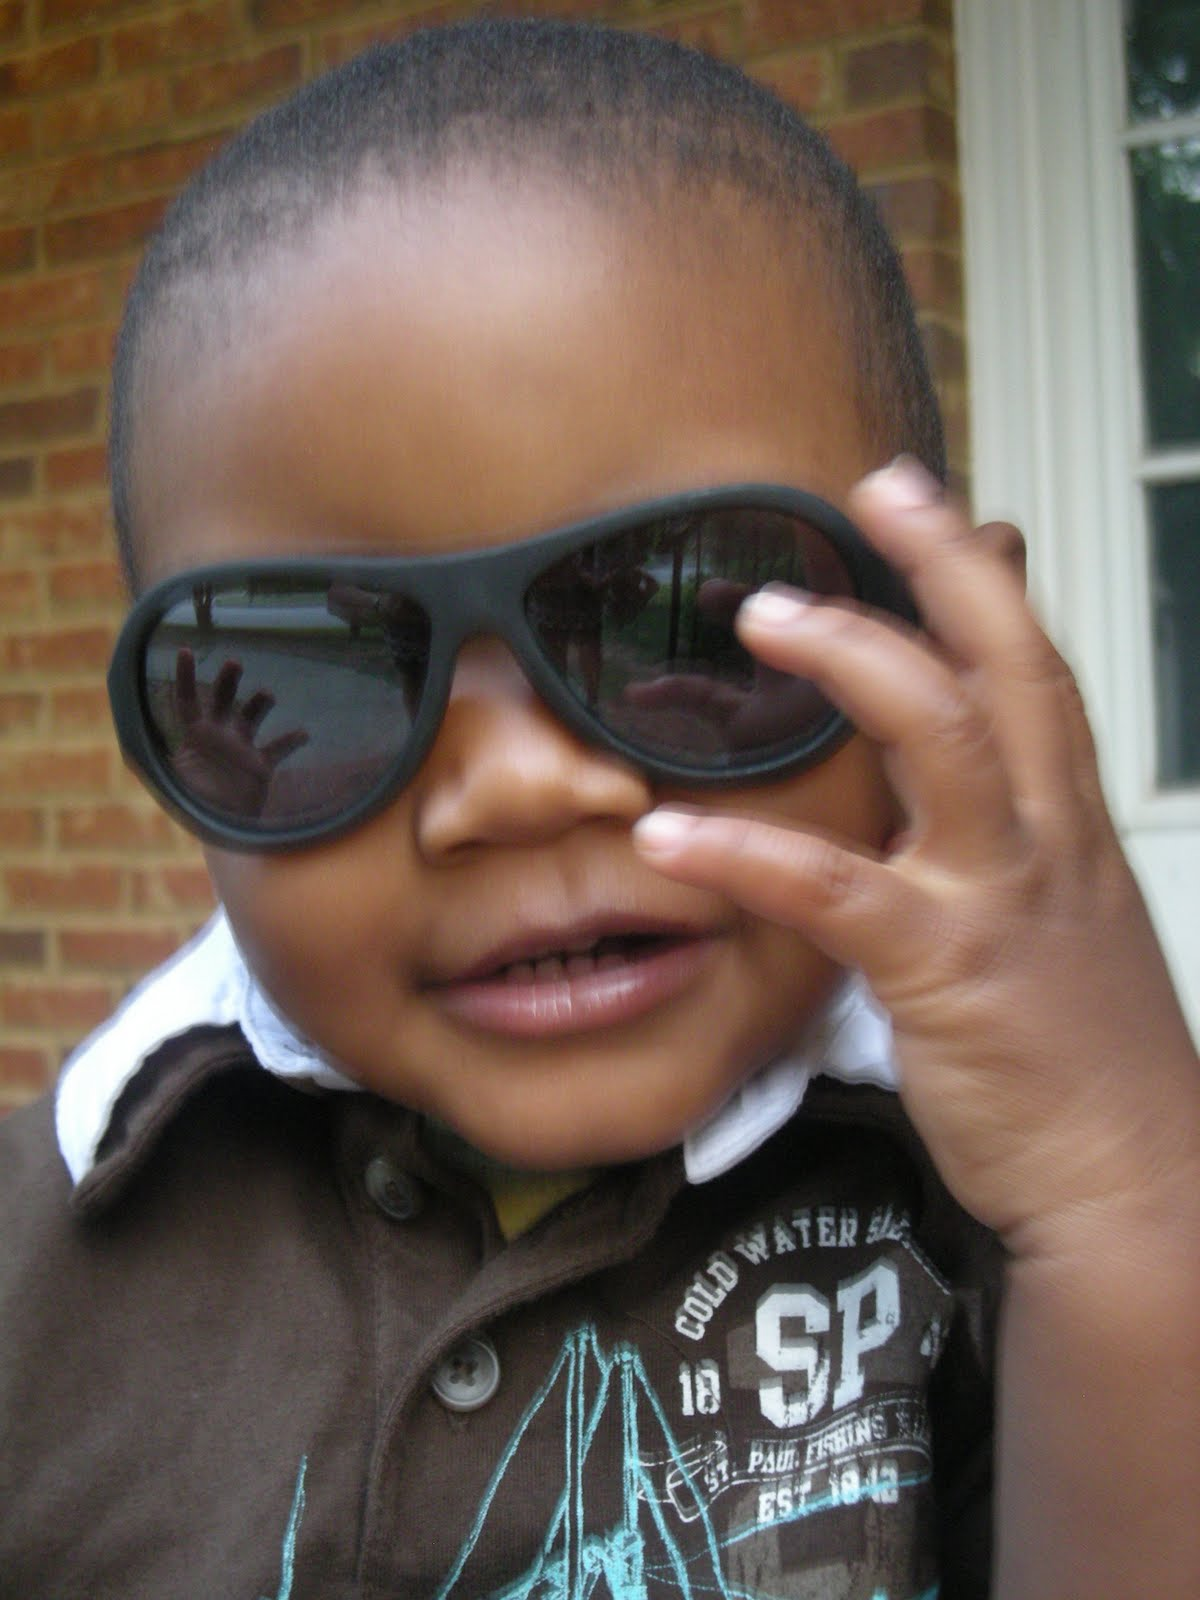 Sojourner Marable Grimmett New Babiators Sunglasses True Blue Classic Ages 3 7 About